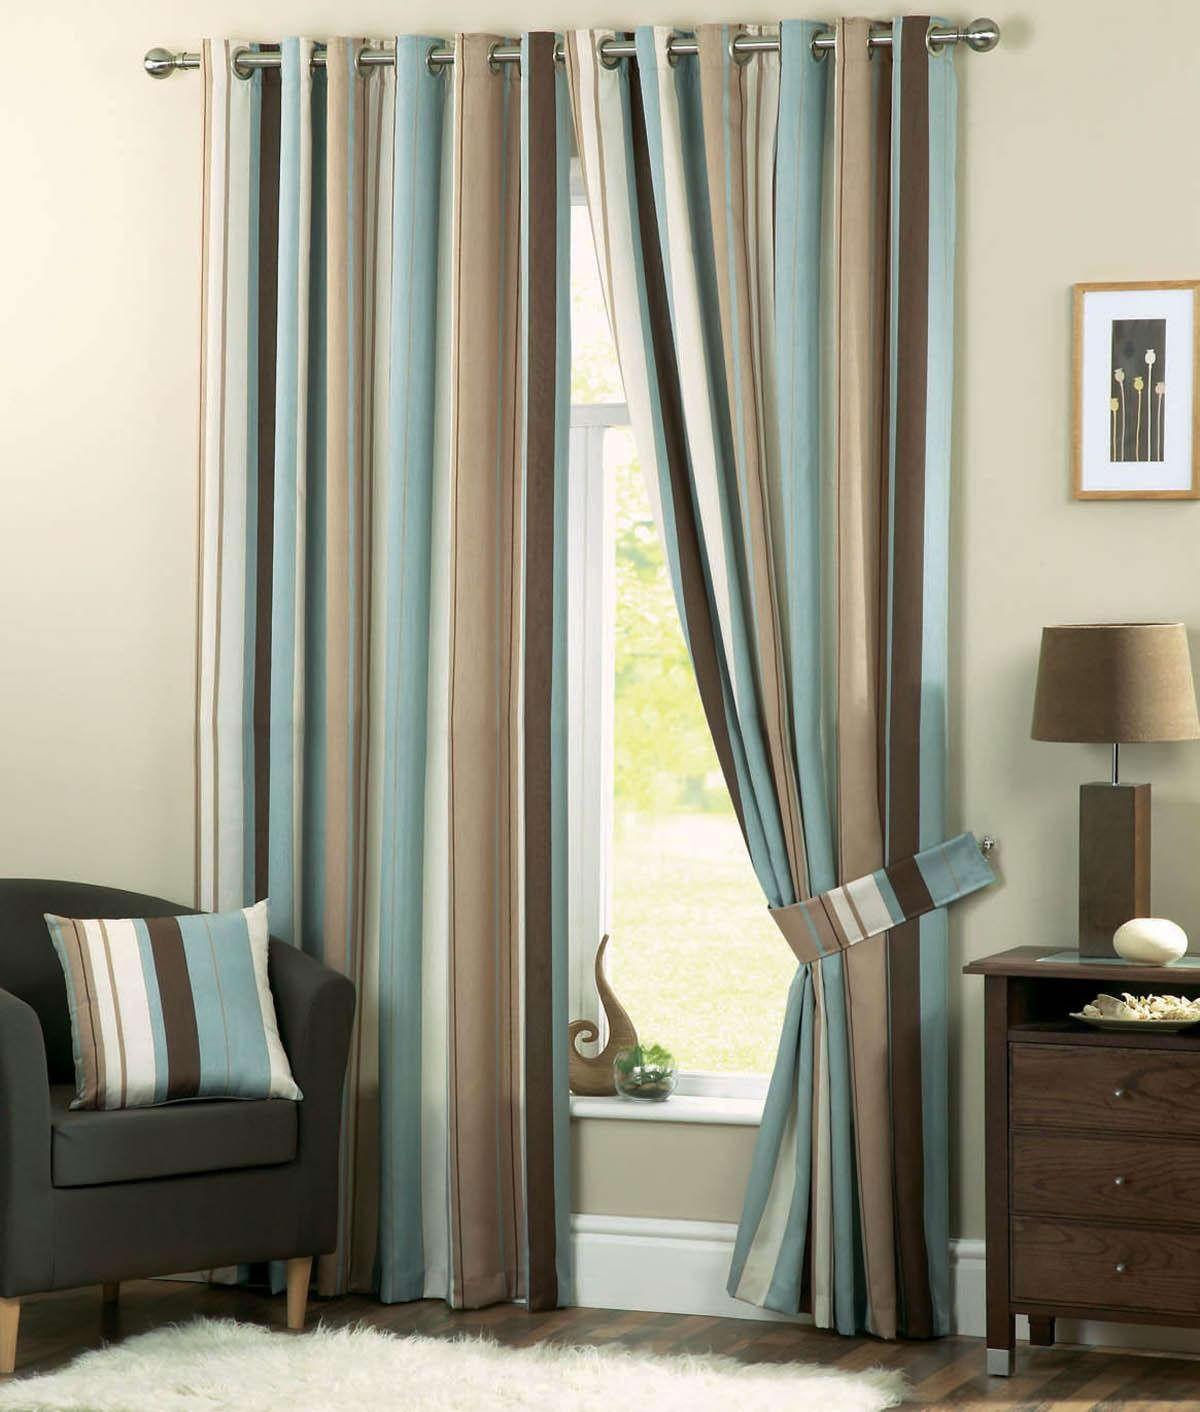 Cool Teal Brown Fabric Modern Striped Window Curtain